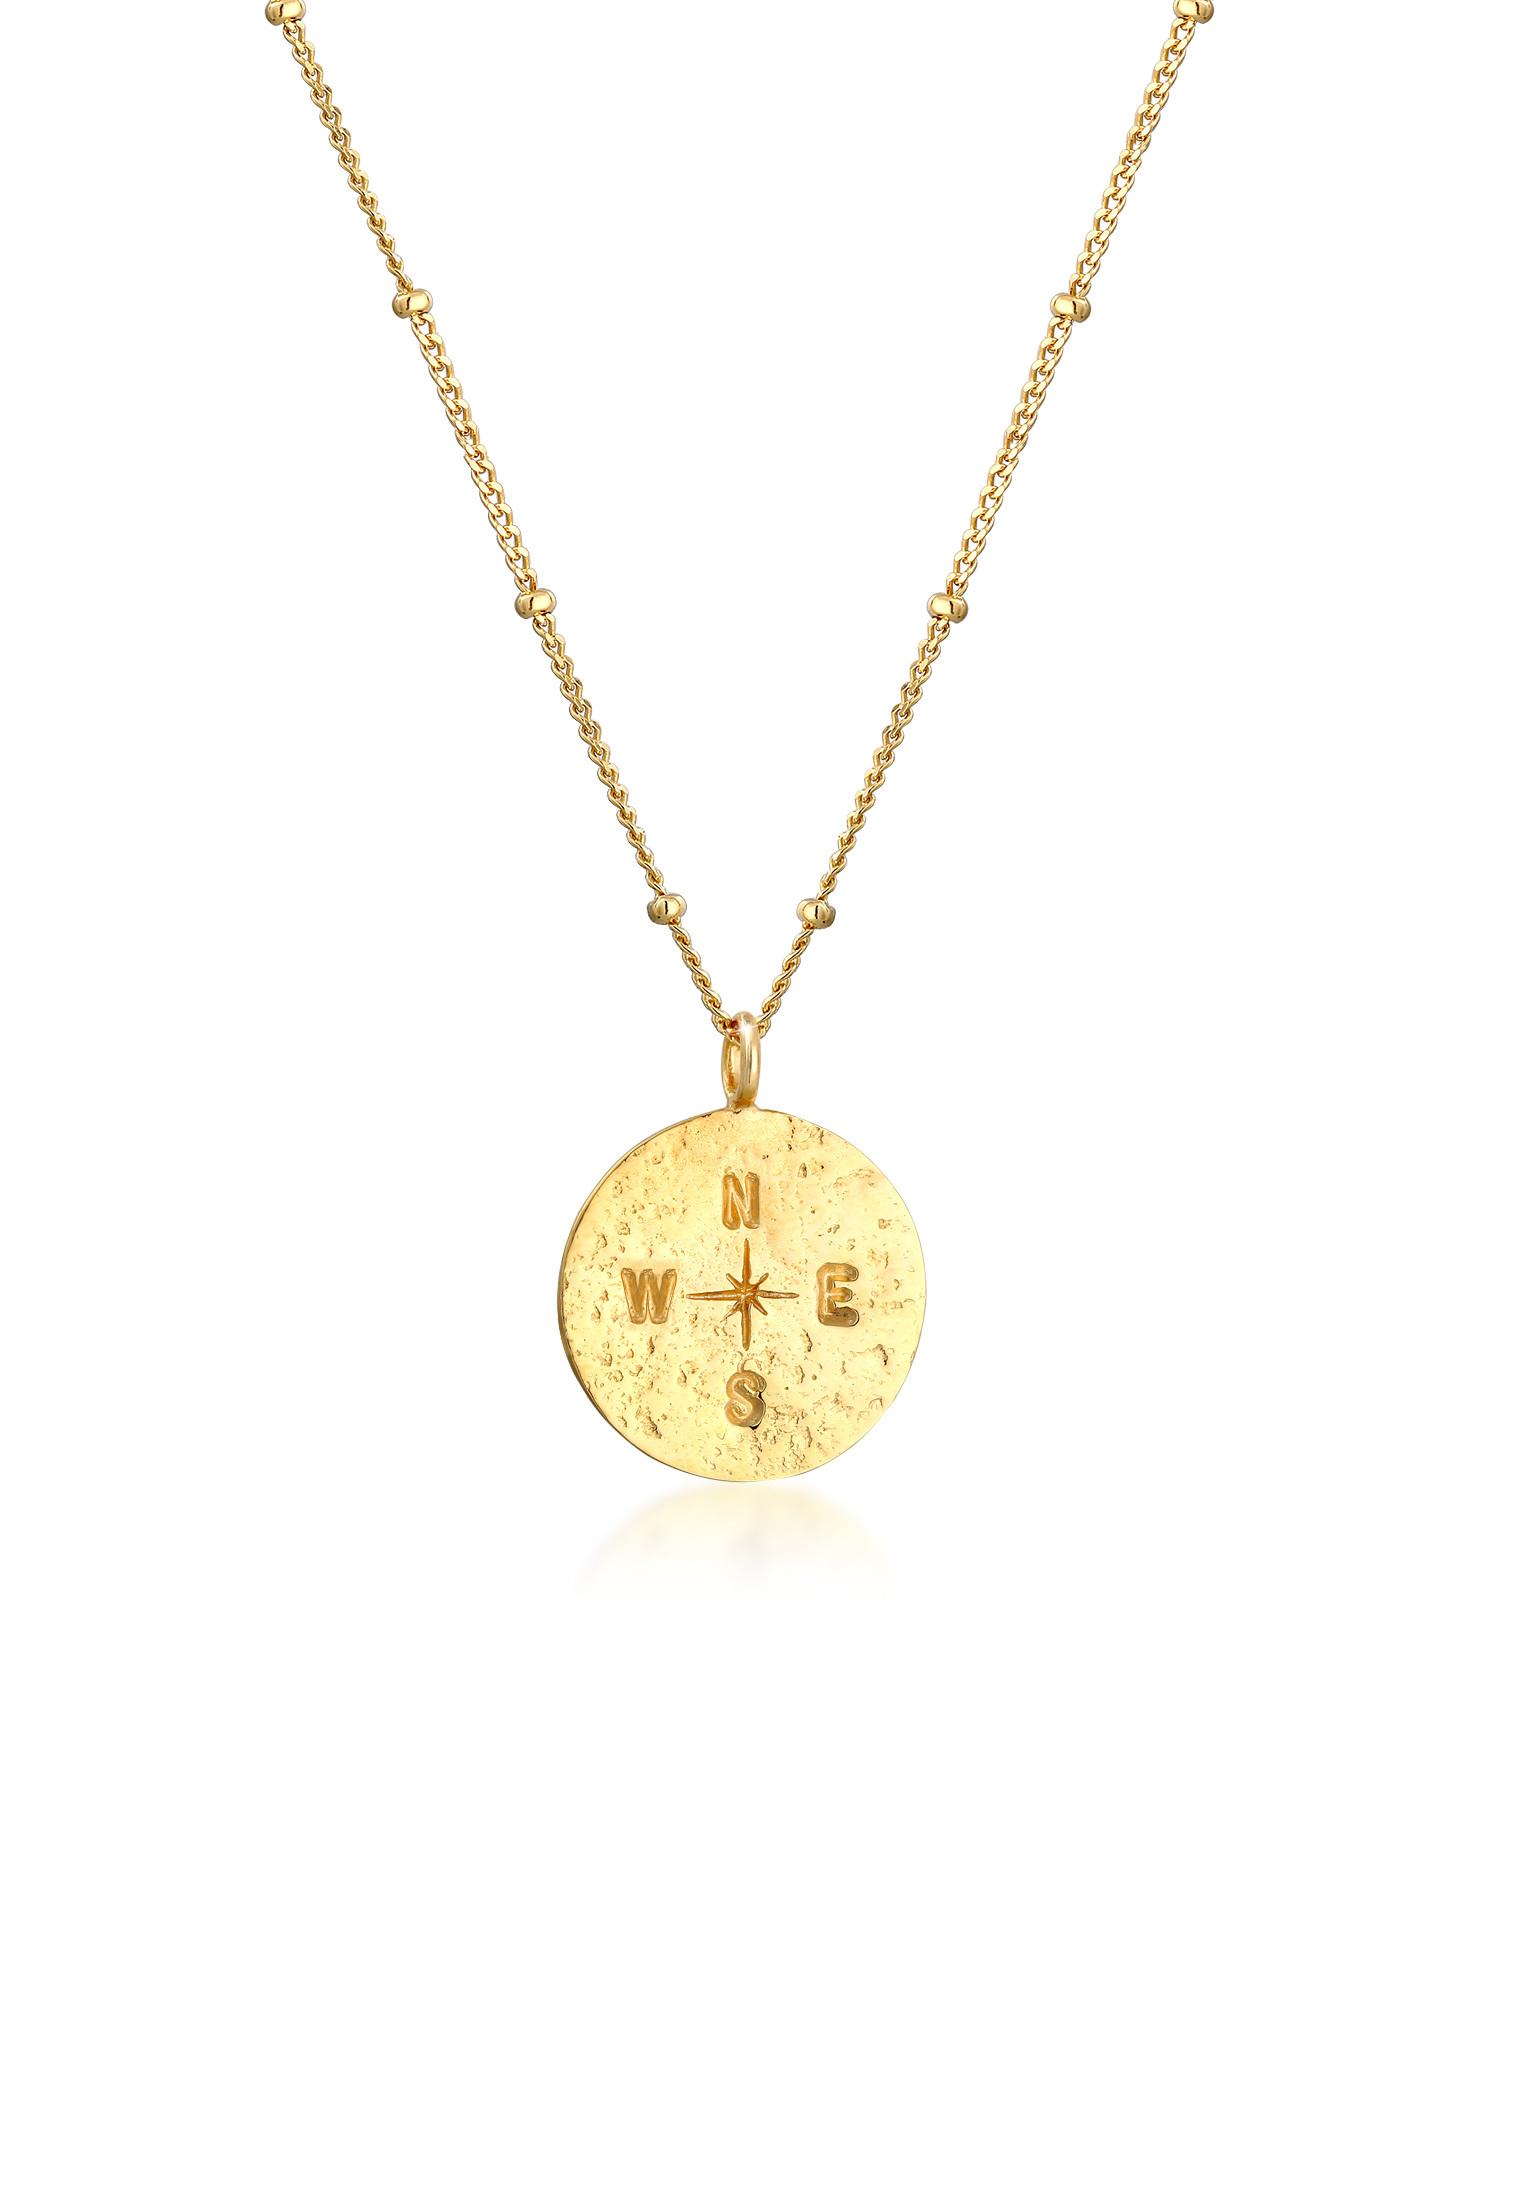 Kugel-Halskette Kompass | 925 Sterling Silber vergoldet